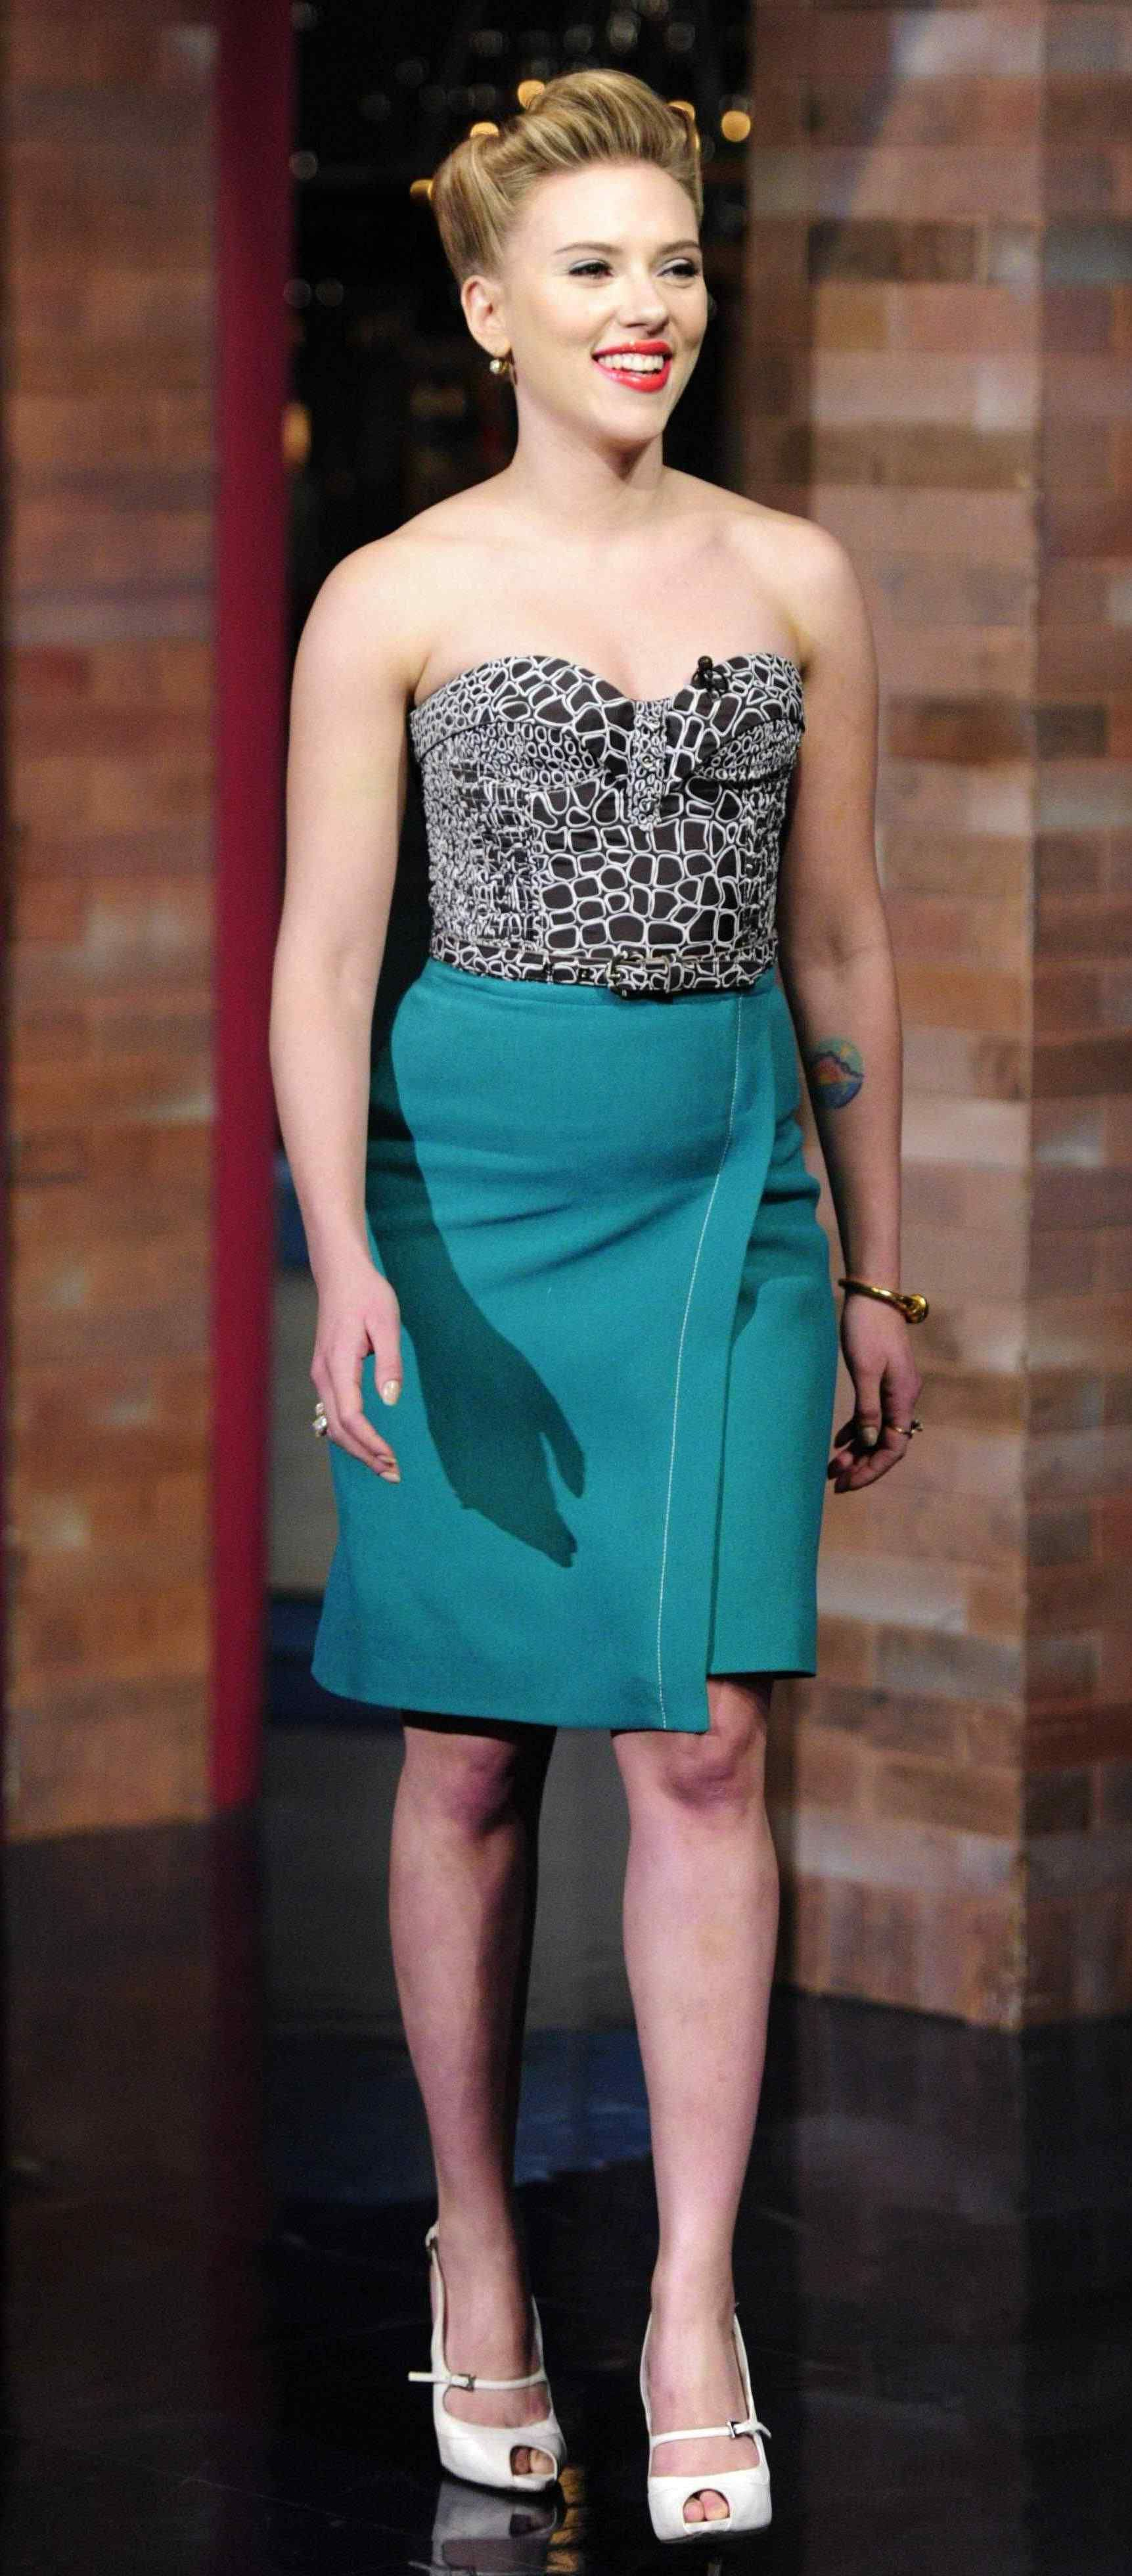 scarlett johansson skirt fashion style with crocodile